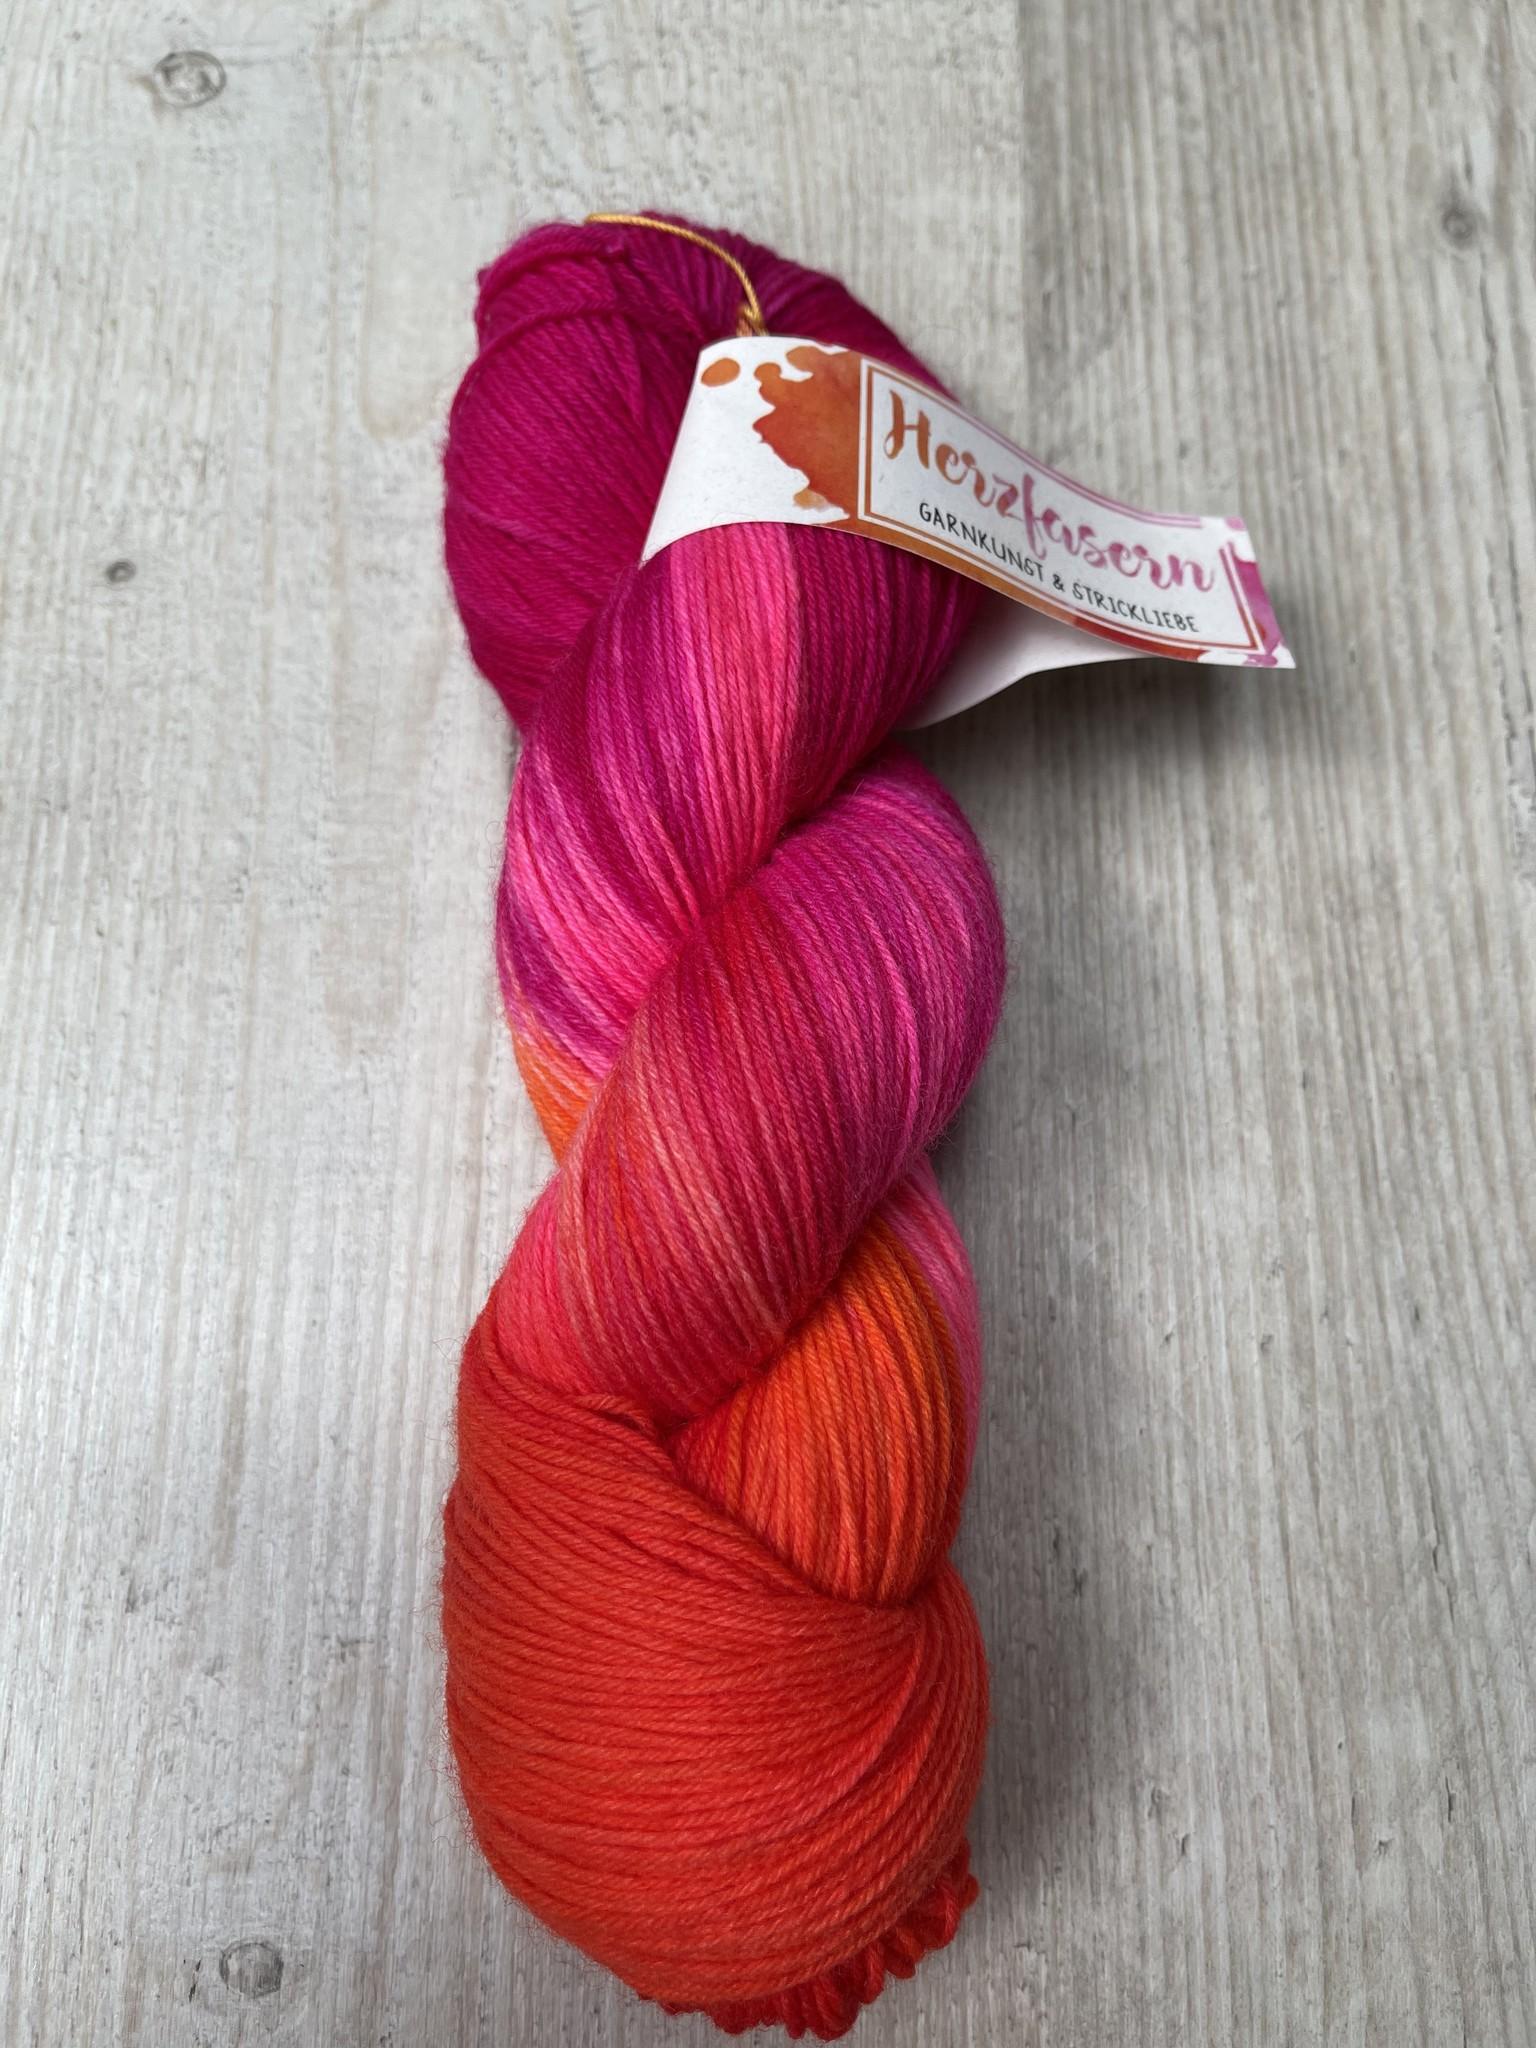 Sockenwolle -  Petras Traum